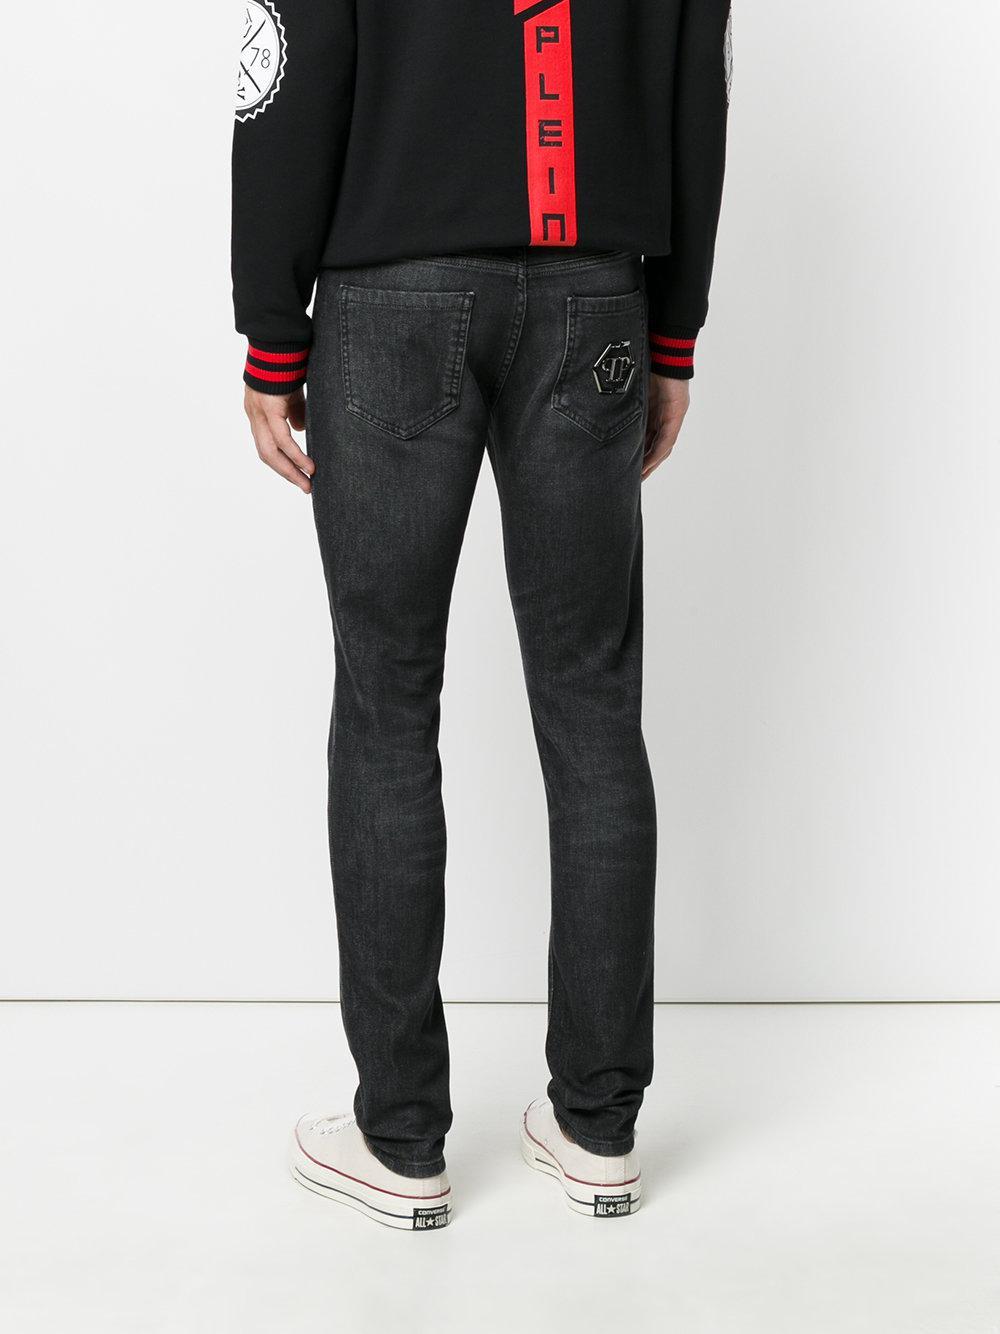 Philipp Plein Denim Slim Fit Jeans With Logo Plaque in Grey (Grey) for Men